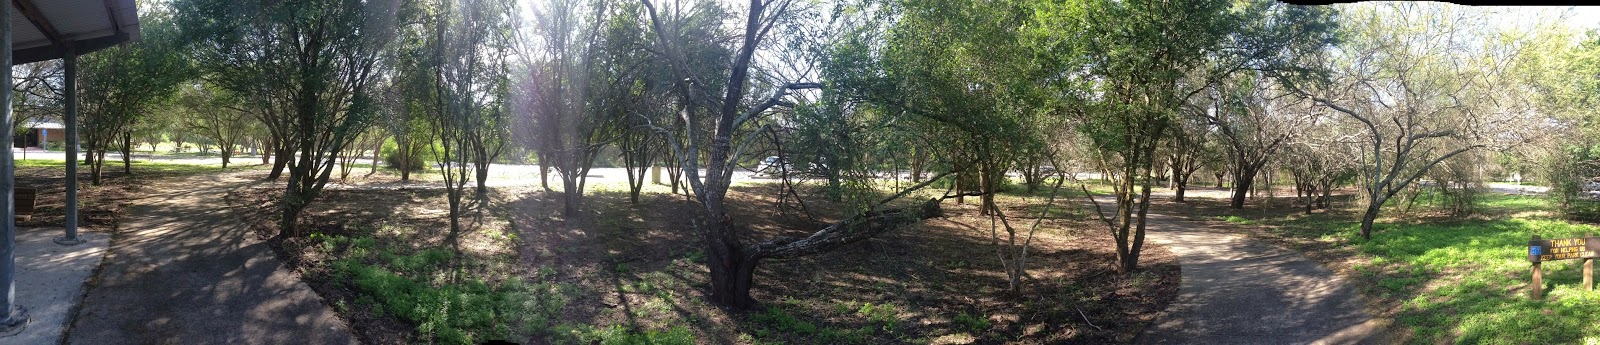 The parking/picnic area at Resaca de la Palma State Park, Brownsville, TX